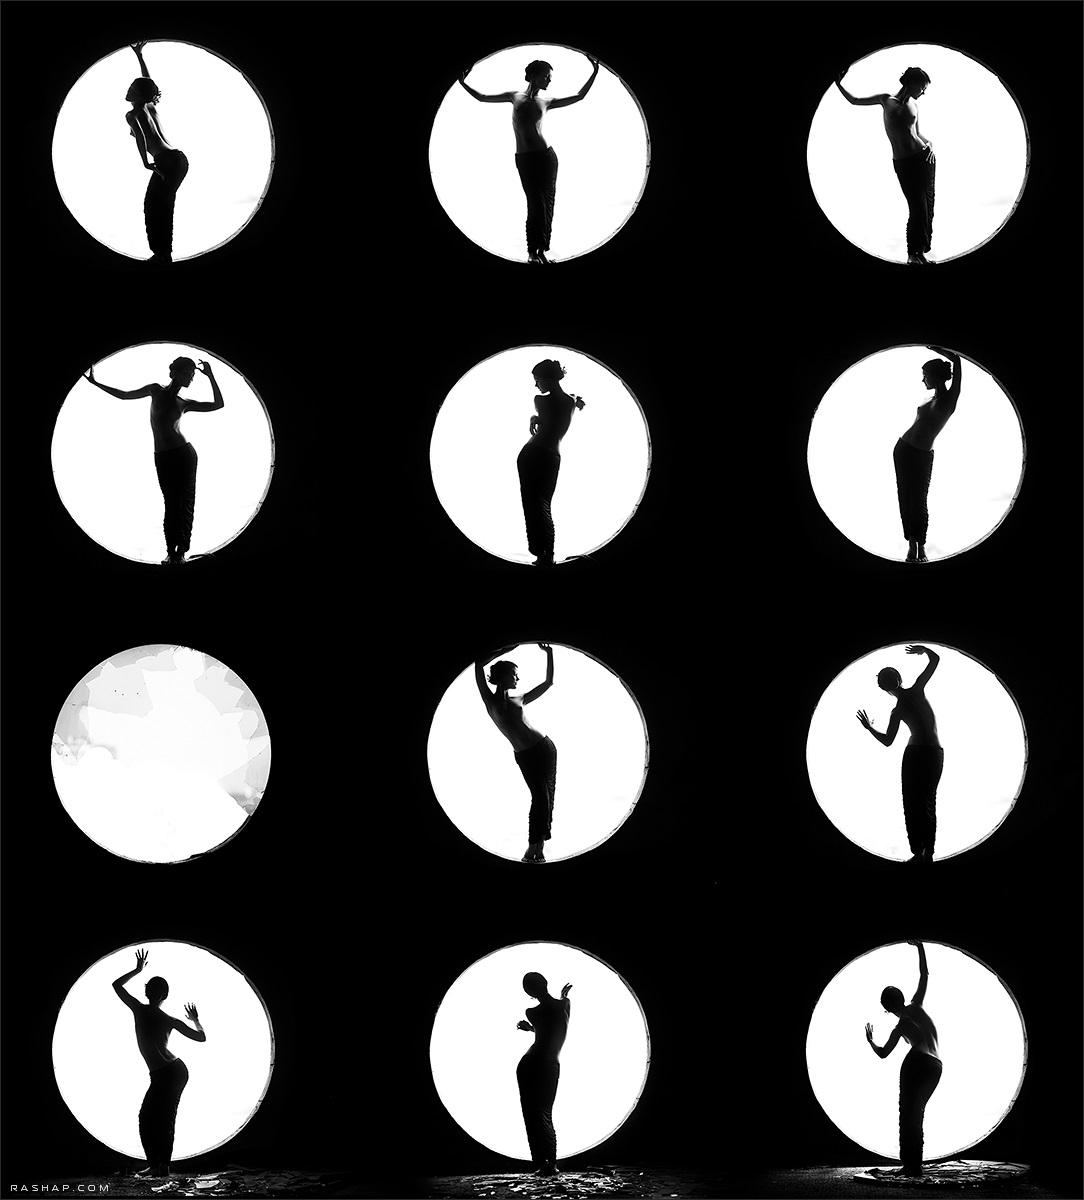 Charming black & white pictures by a photographer Ilya Rashap - 19